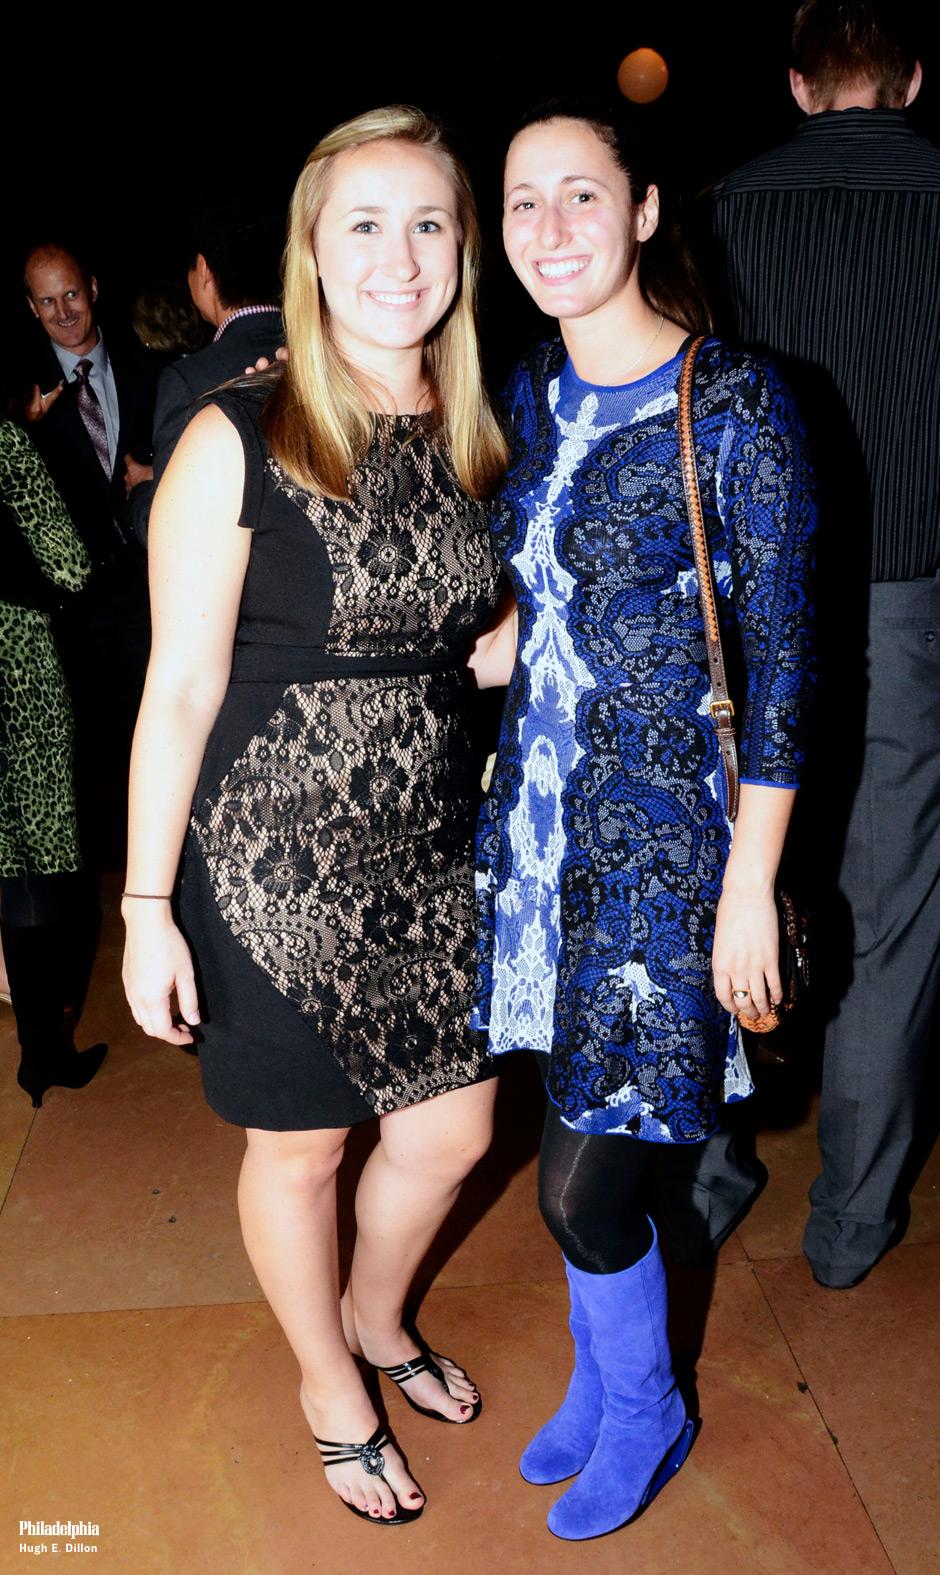 Alison Becker and Danielle Hankin